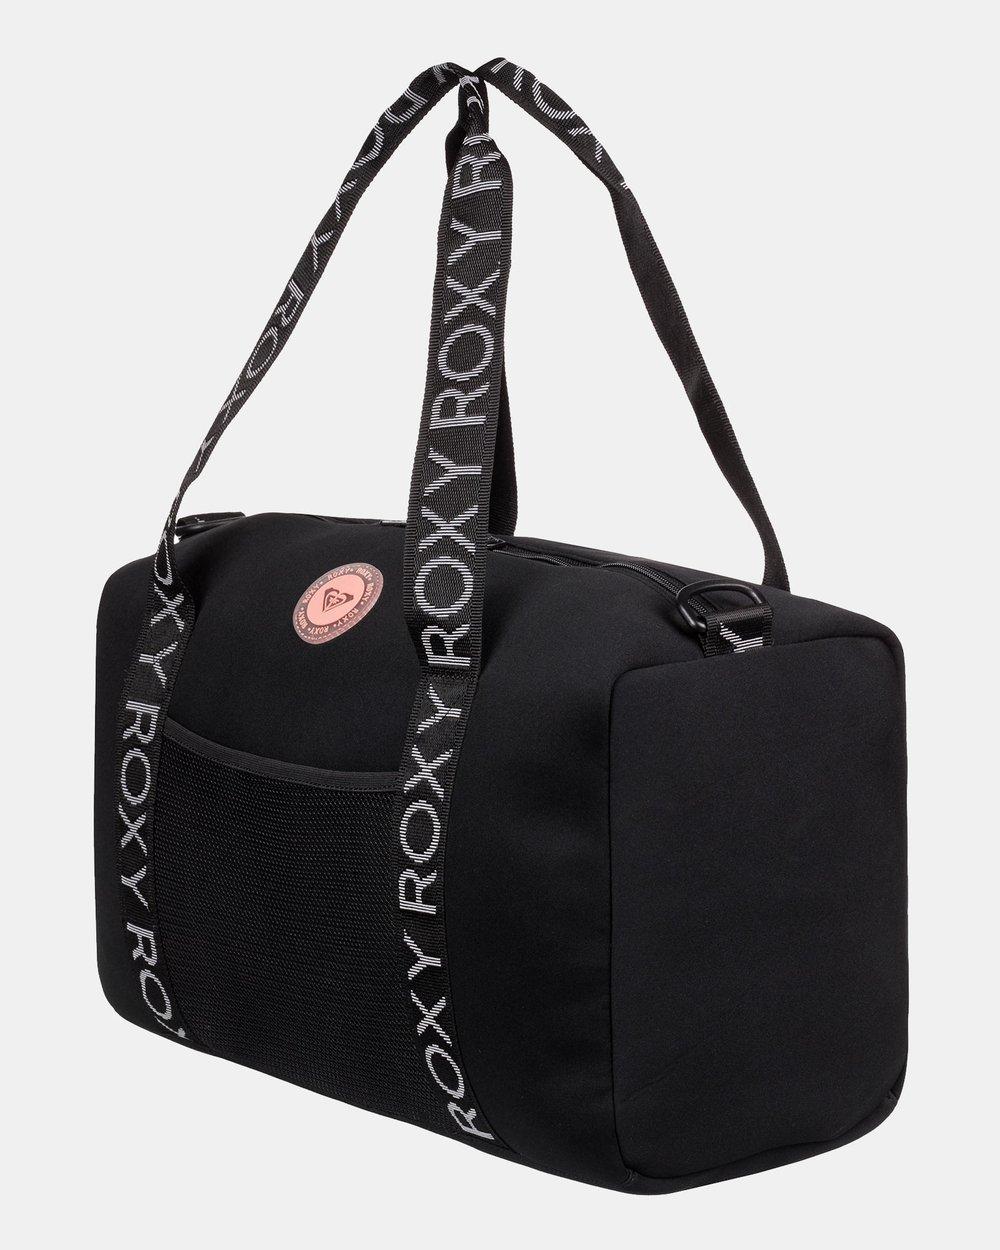 15610a68d55ee3 Moonfire Neoprene Logo Sports Duffle Bag by Roxy Online | THE ICONIC |  Australia